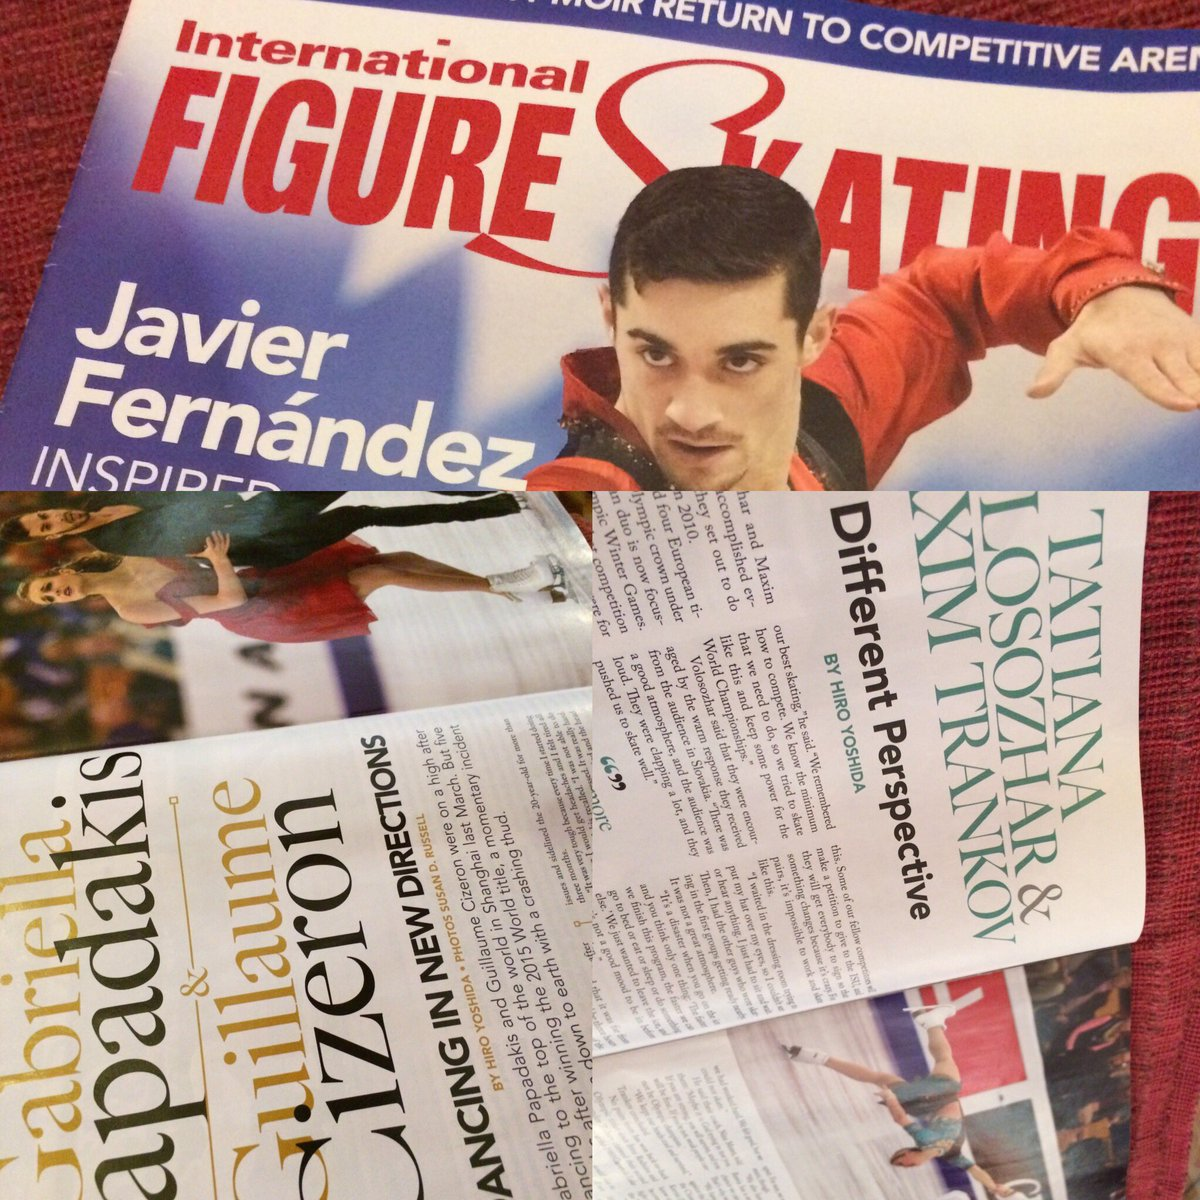 Хавьер Фернандес /Javier FERNANDEZ ESP - Страница 11 Ci16fwSXIAAM3Bv